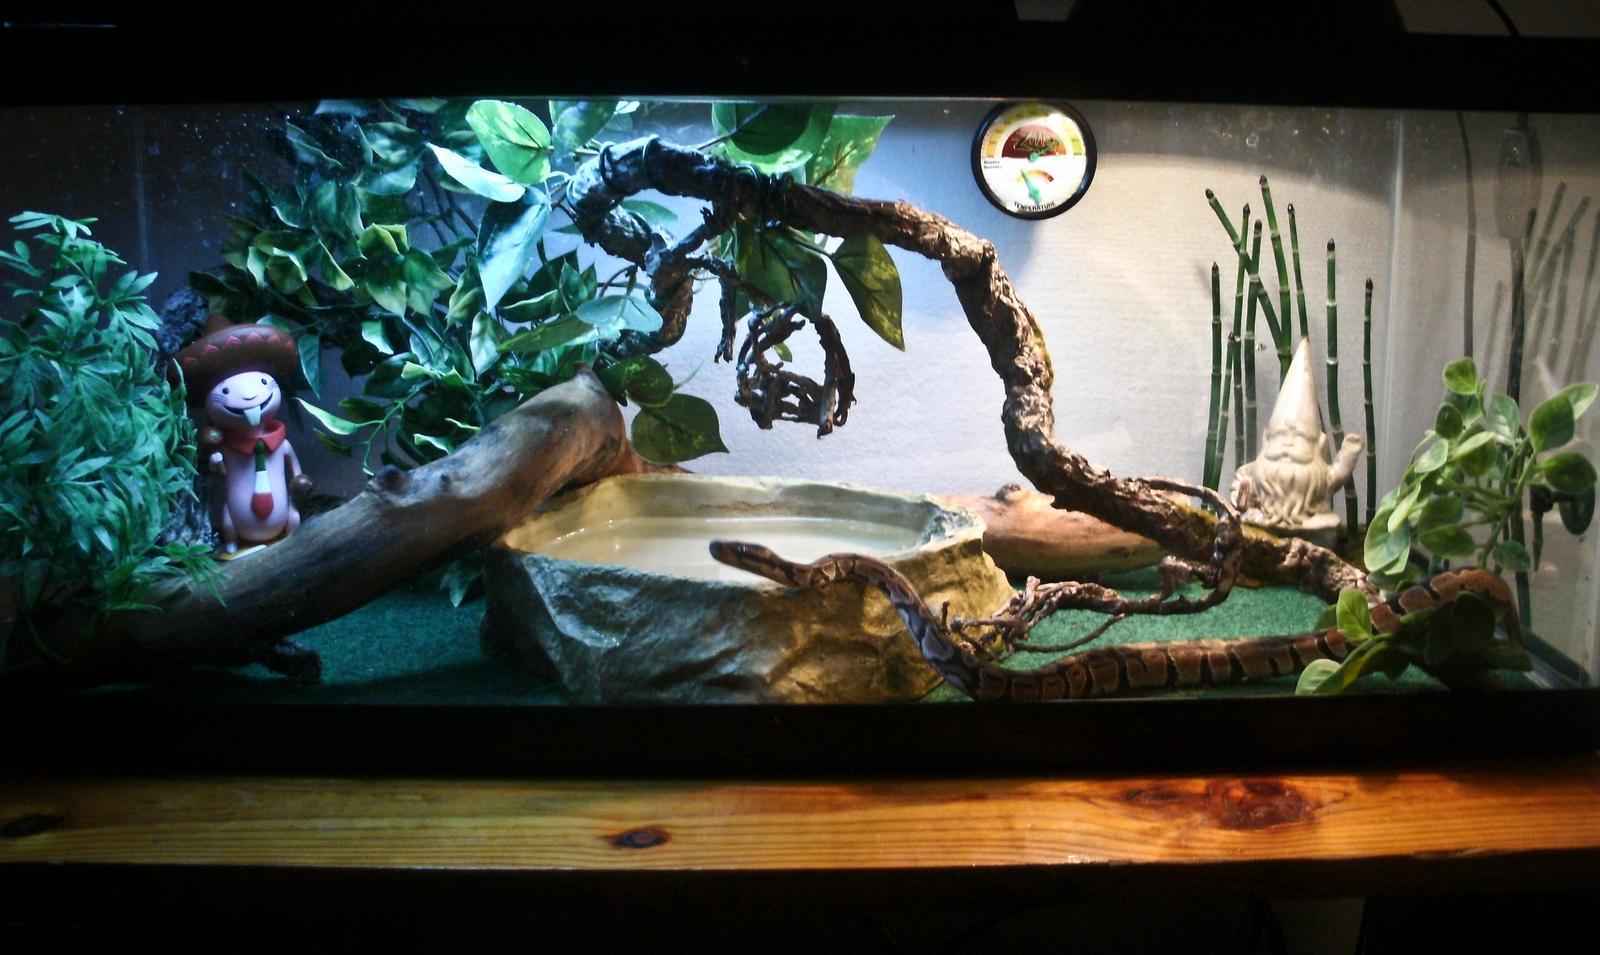 Super Crazy Snake Habitat By Lita584 On Deviantart